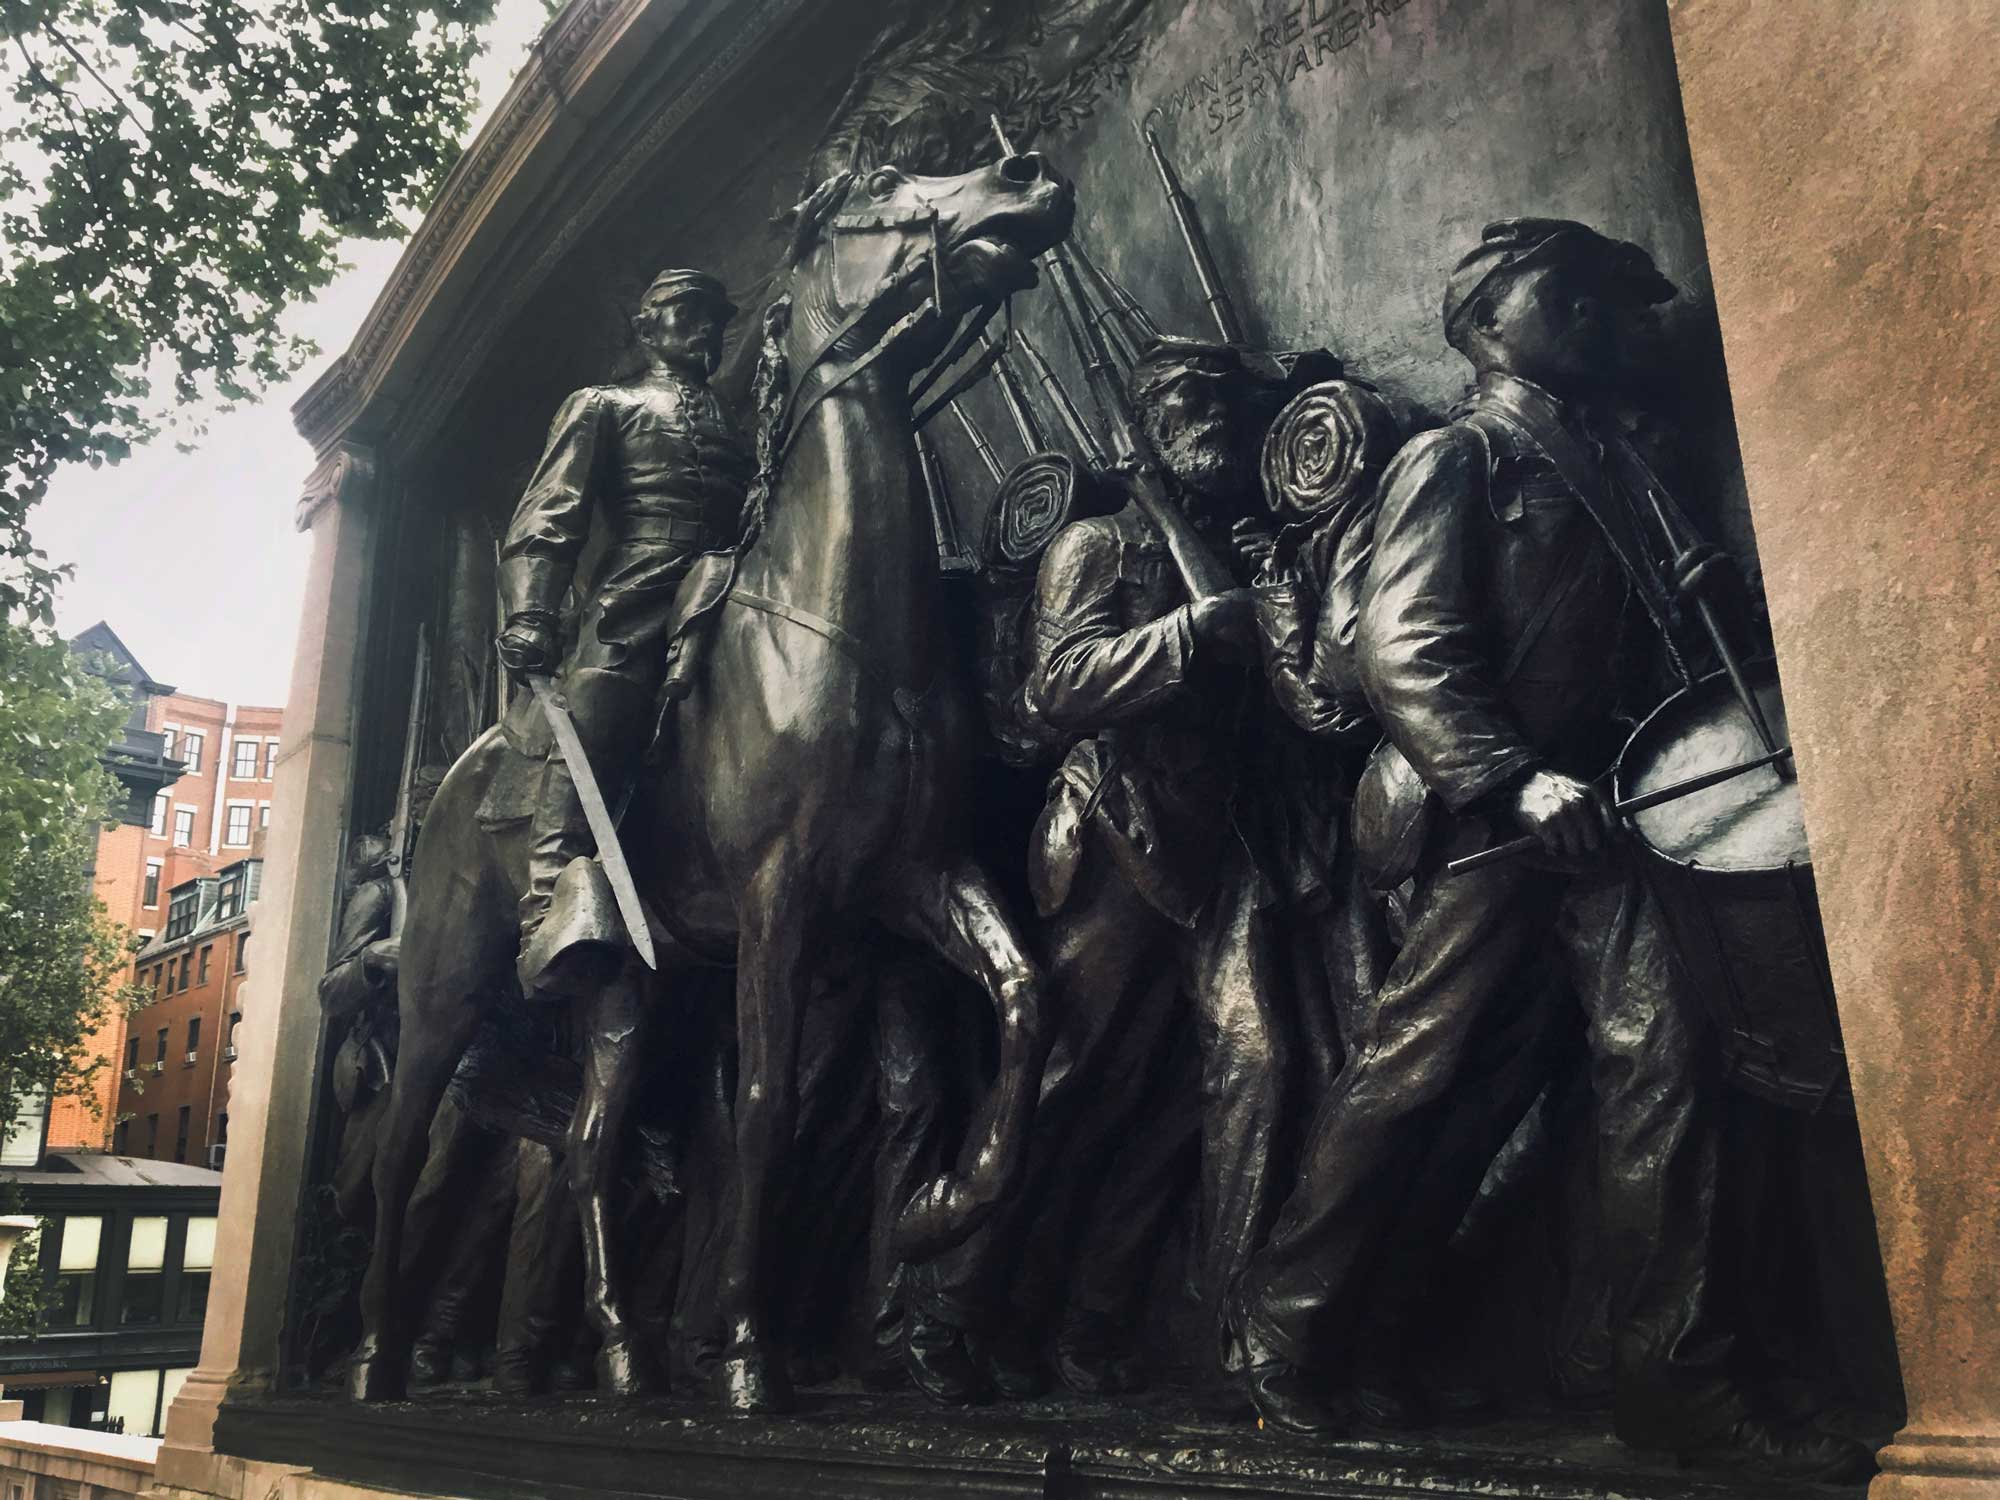 Shaw Memorial on Freedom Trail in Boston, Massachusetts